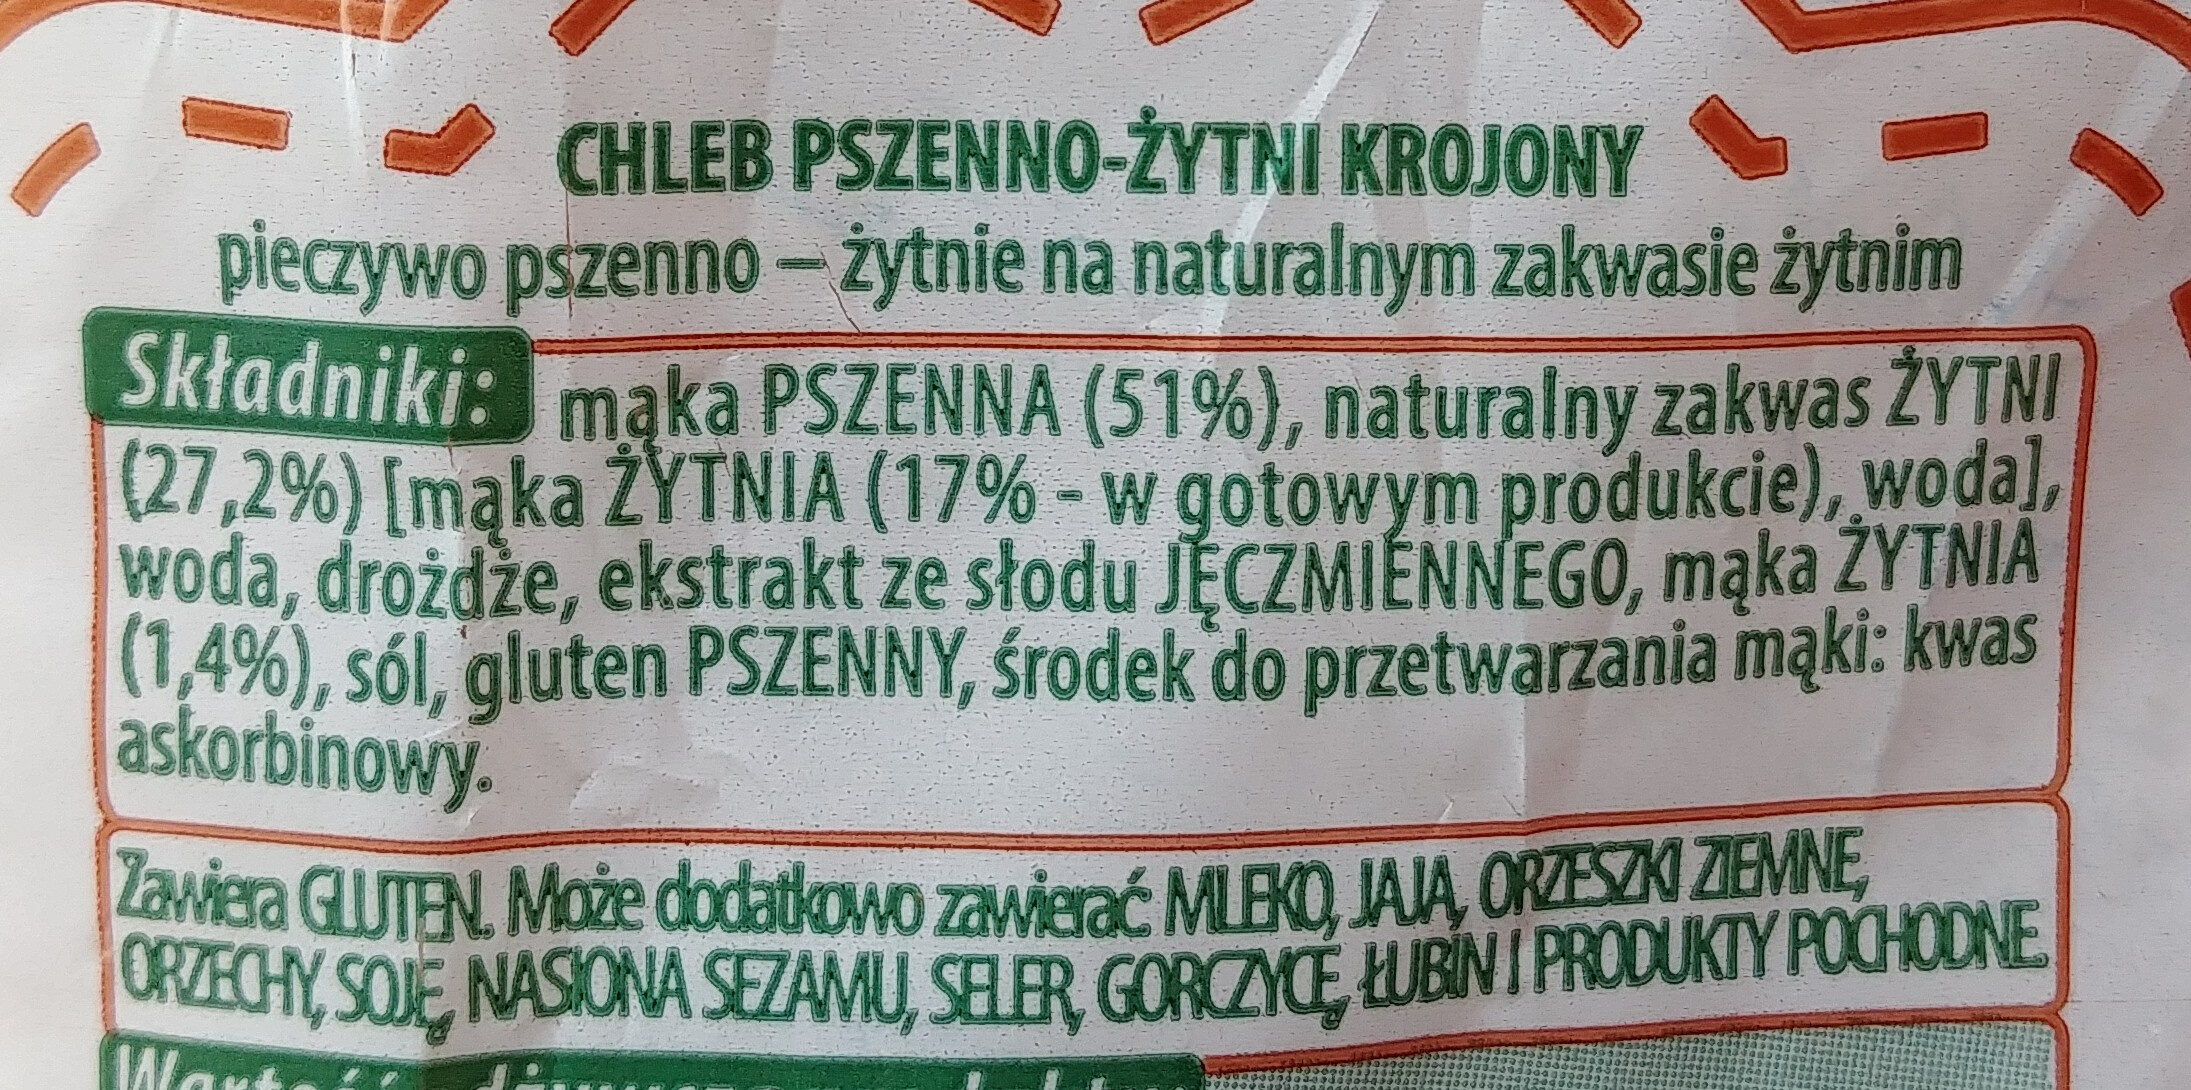 Chleb pszenno-żytni krojony. - Składniki - pl